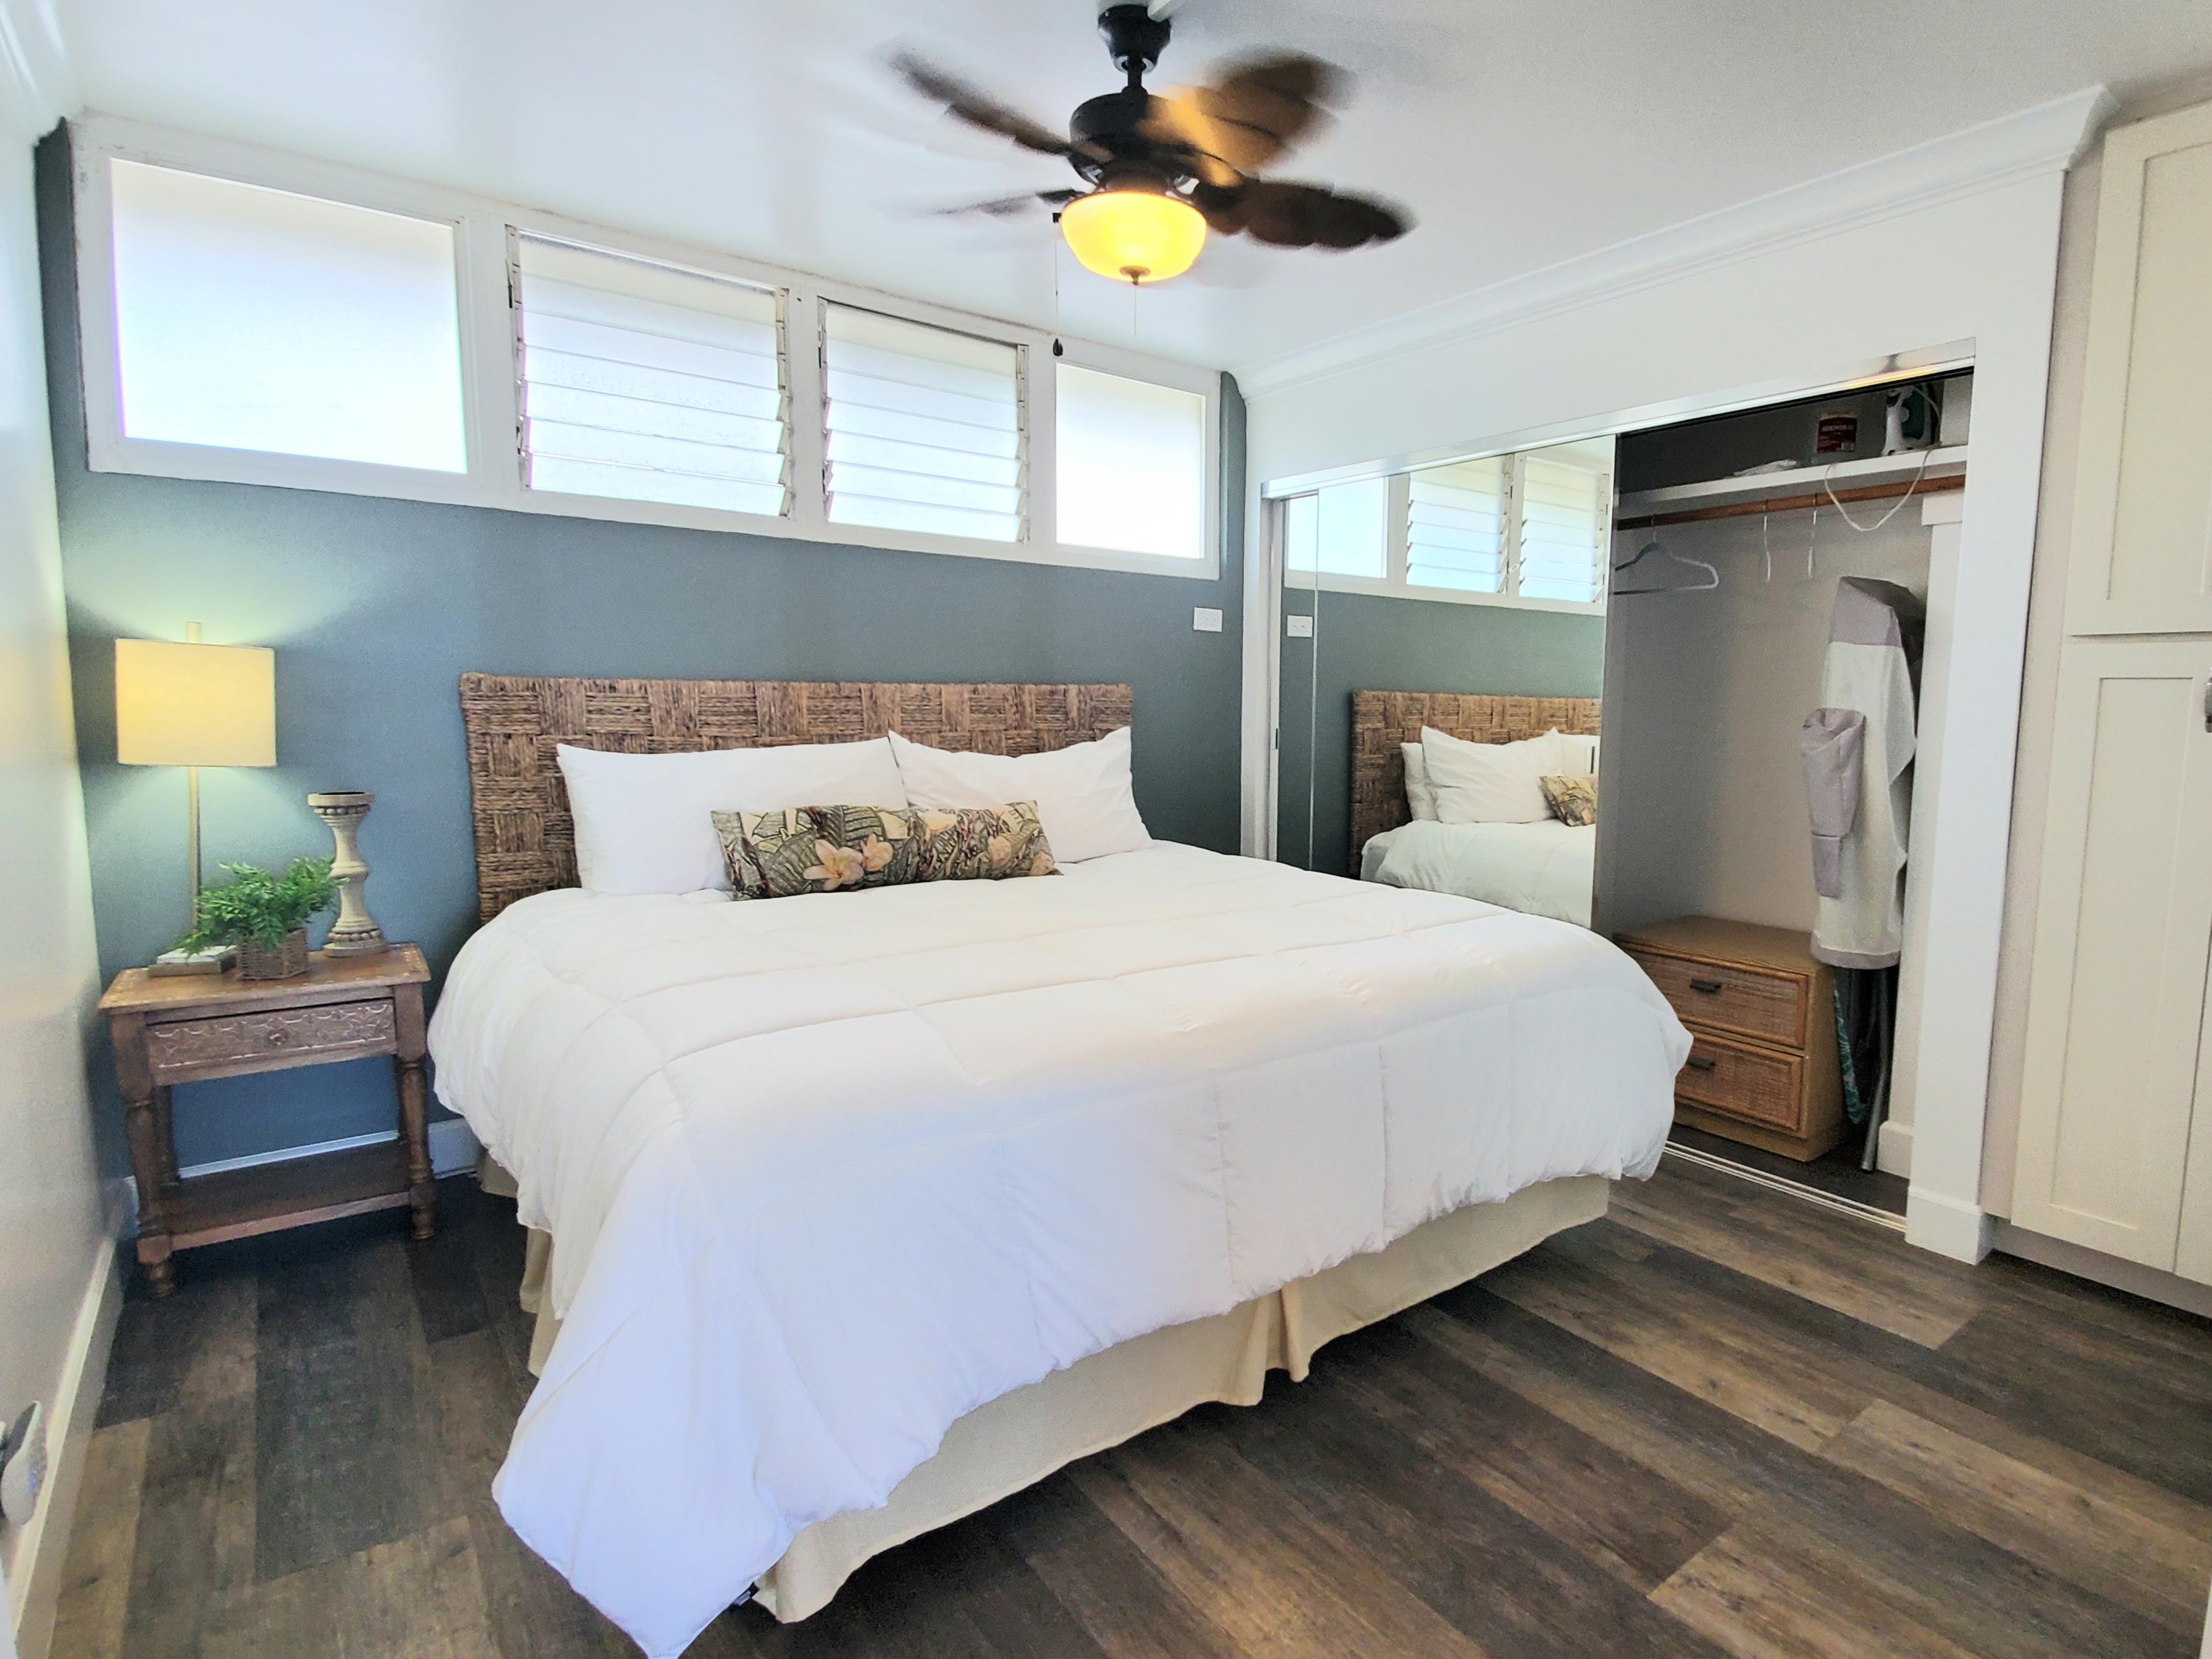 Maui Hawaii vacation rental condo for sale | Maui Hawaii Realtor Jesse Coffey with Keller Williams Realty